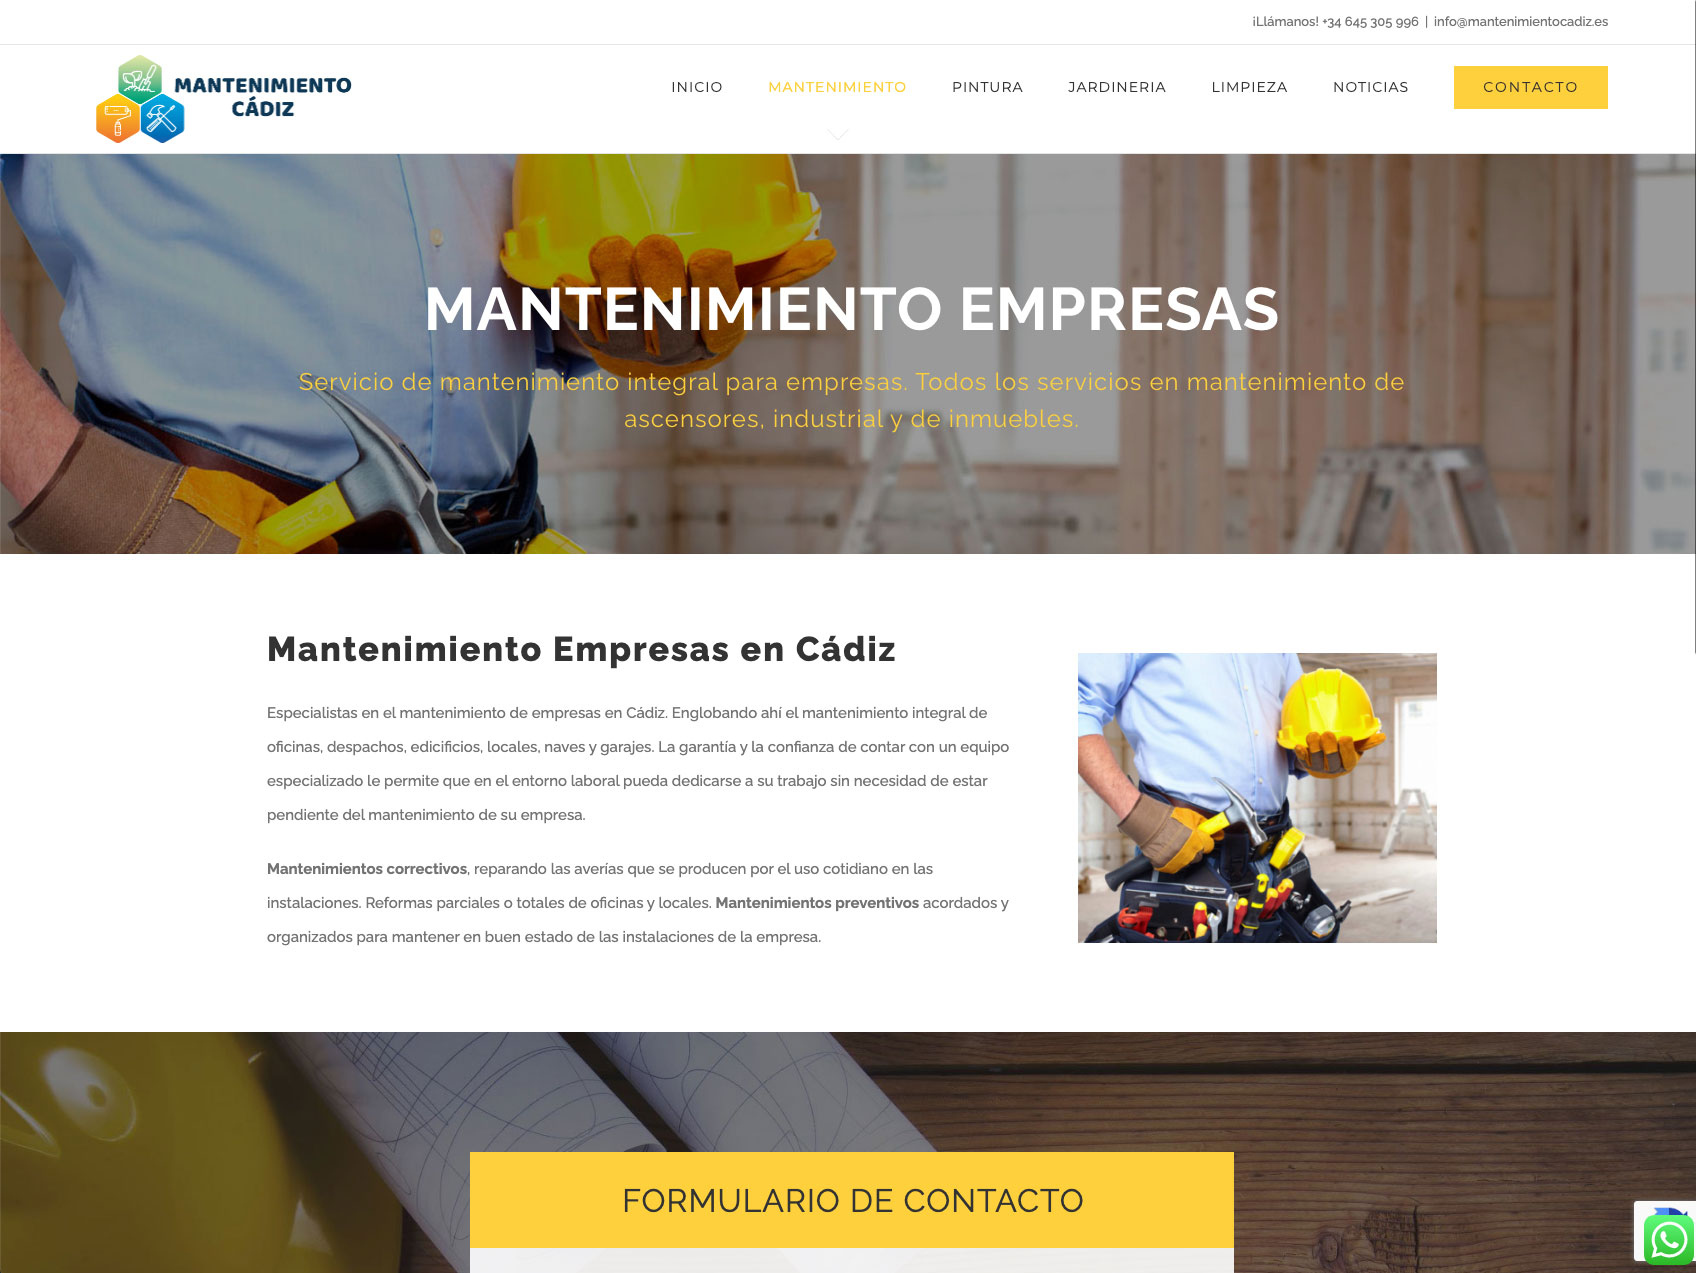 diseno web mantenimiento cadiz